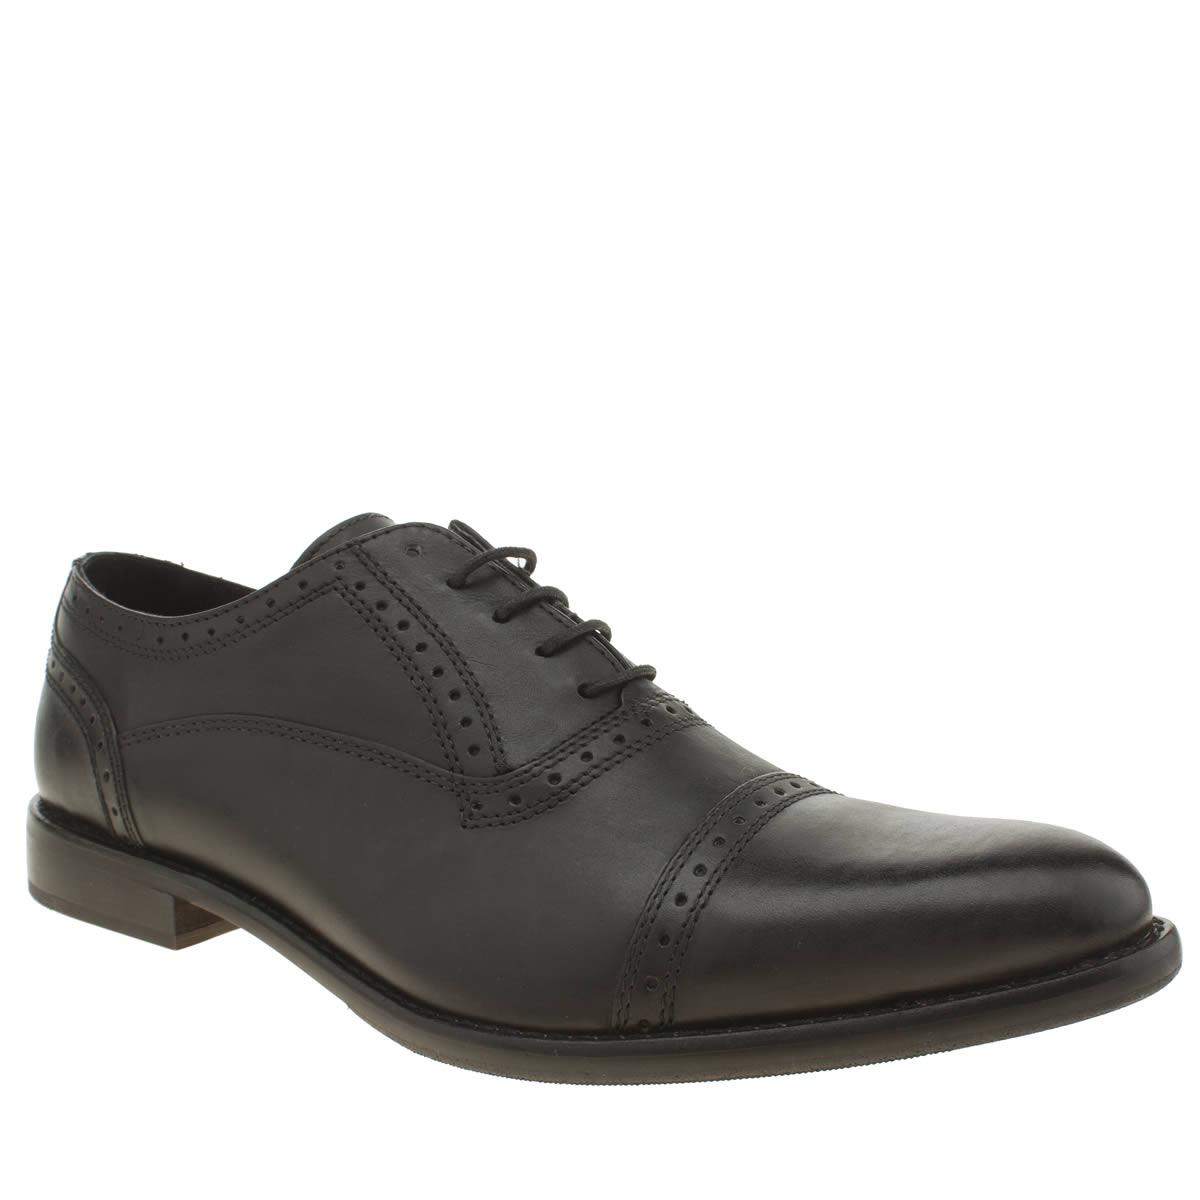 Ikon Ikon Black Holdcap Oxford Shoes